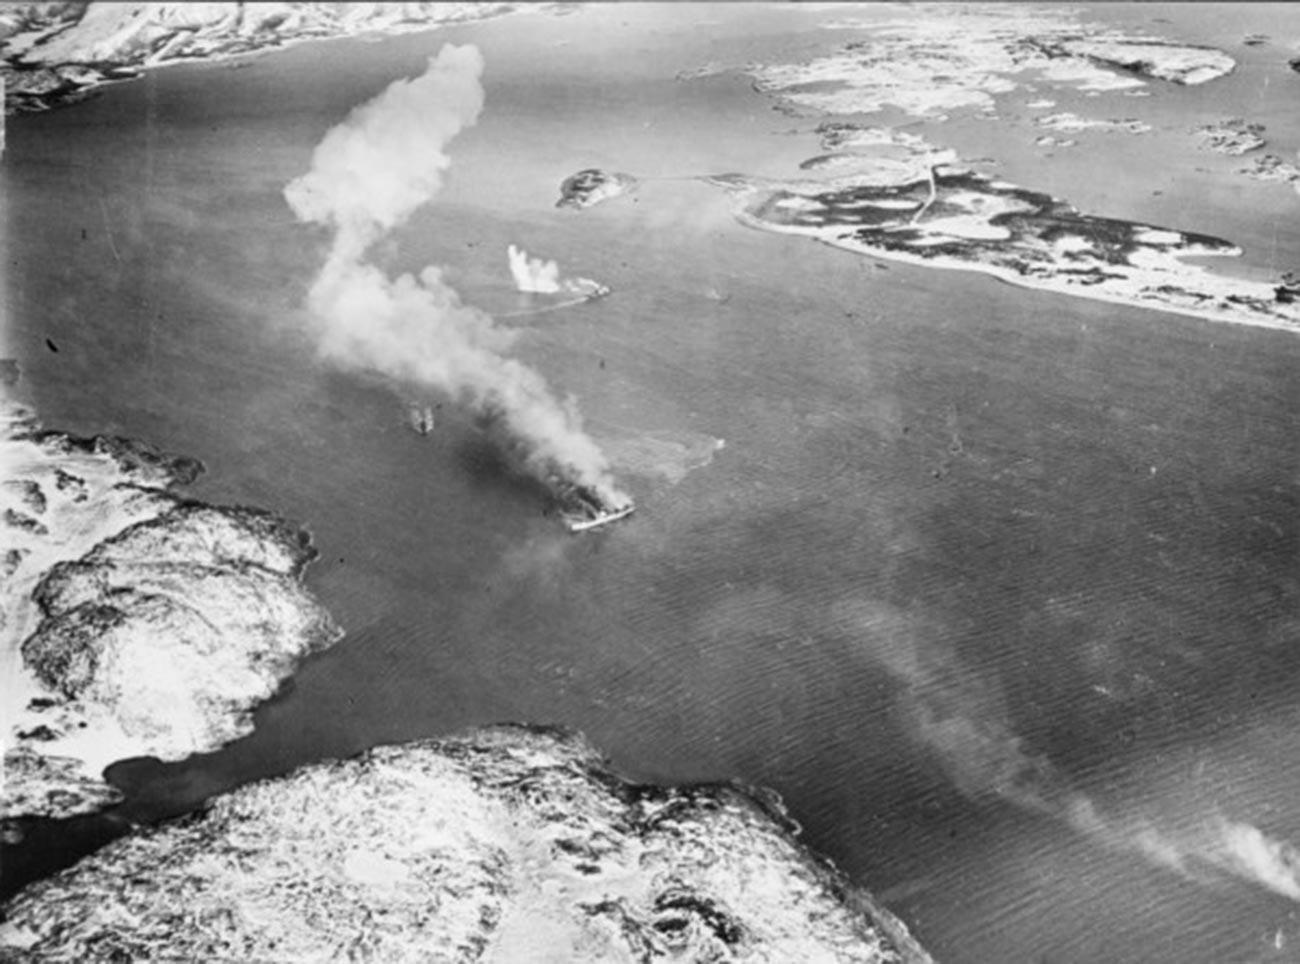 Kapal Rigel dan kapal pengawal kecil Jerman terbakar setelah dibom dan ditembaki oleh pesawat Inggris.